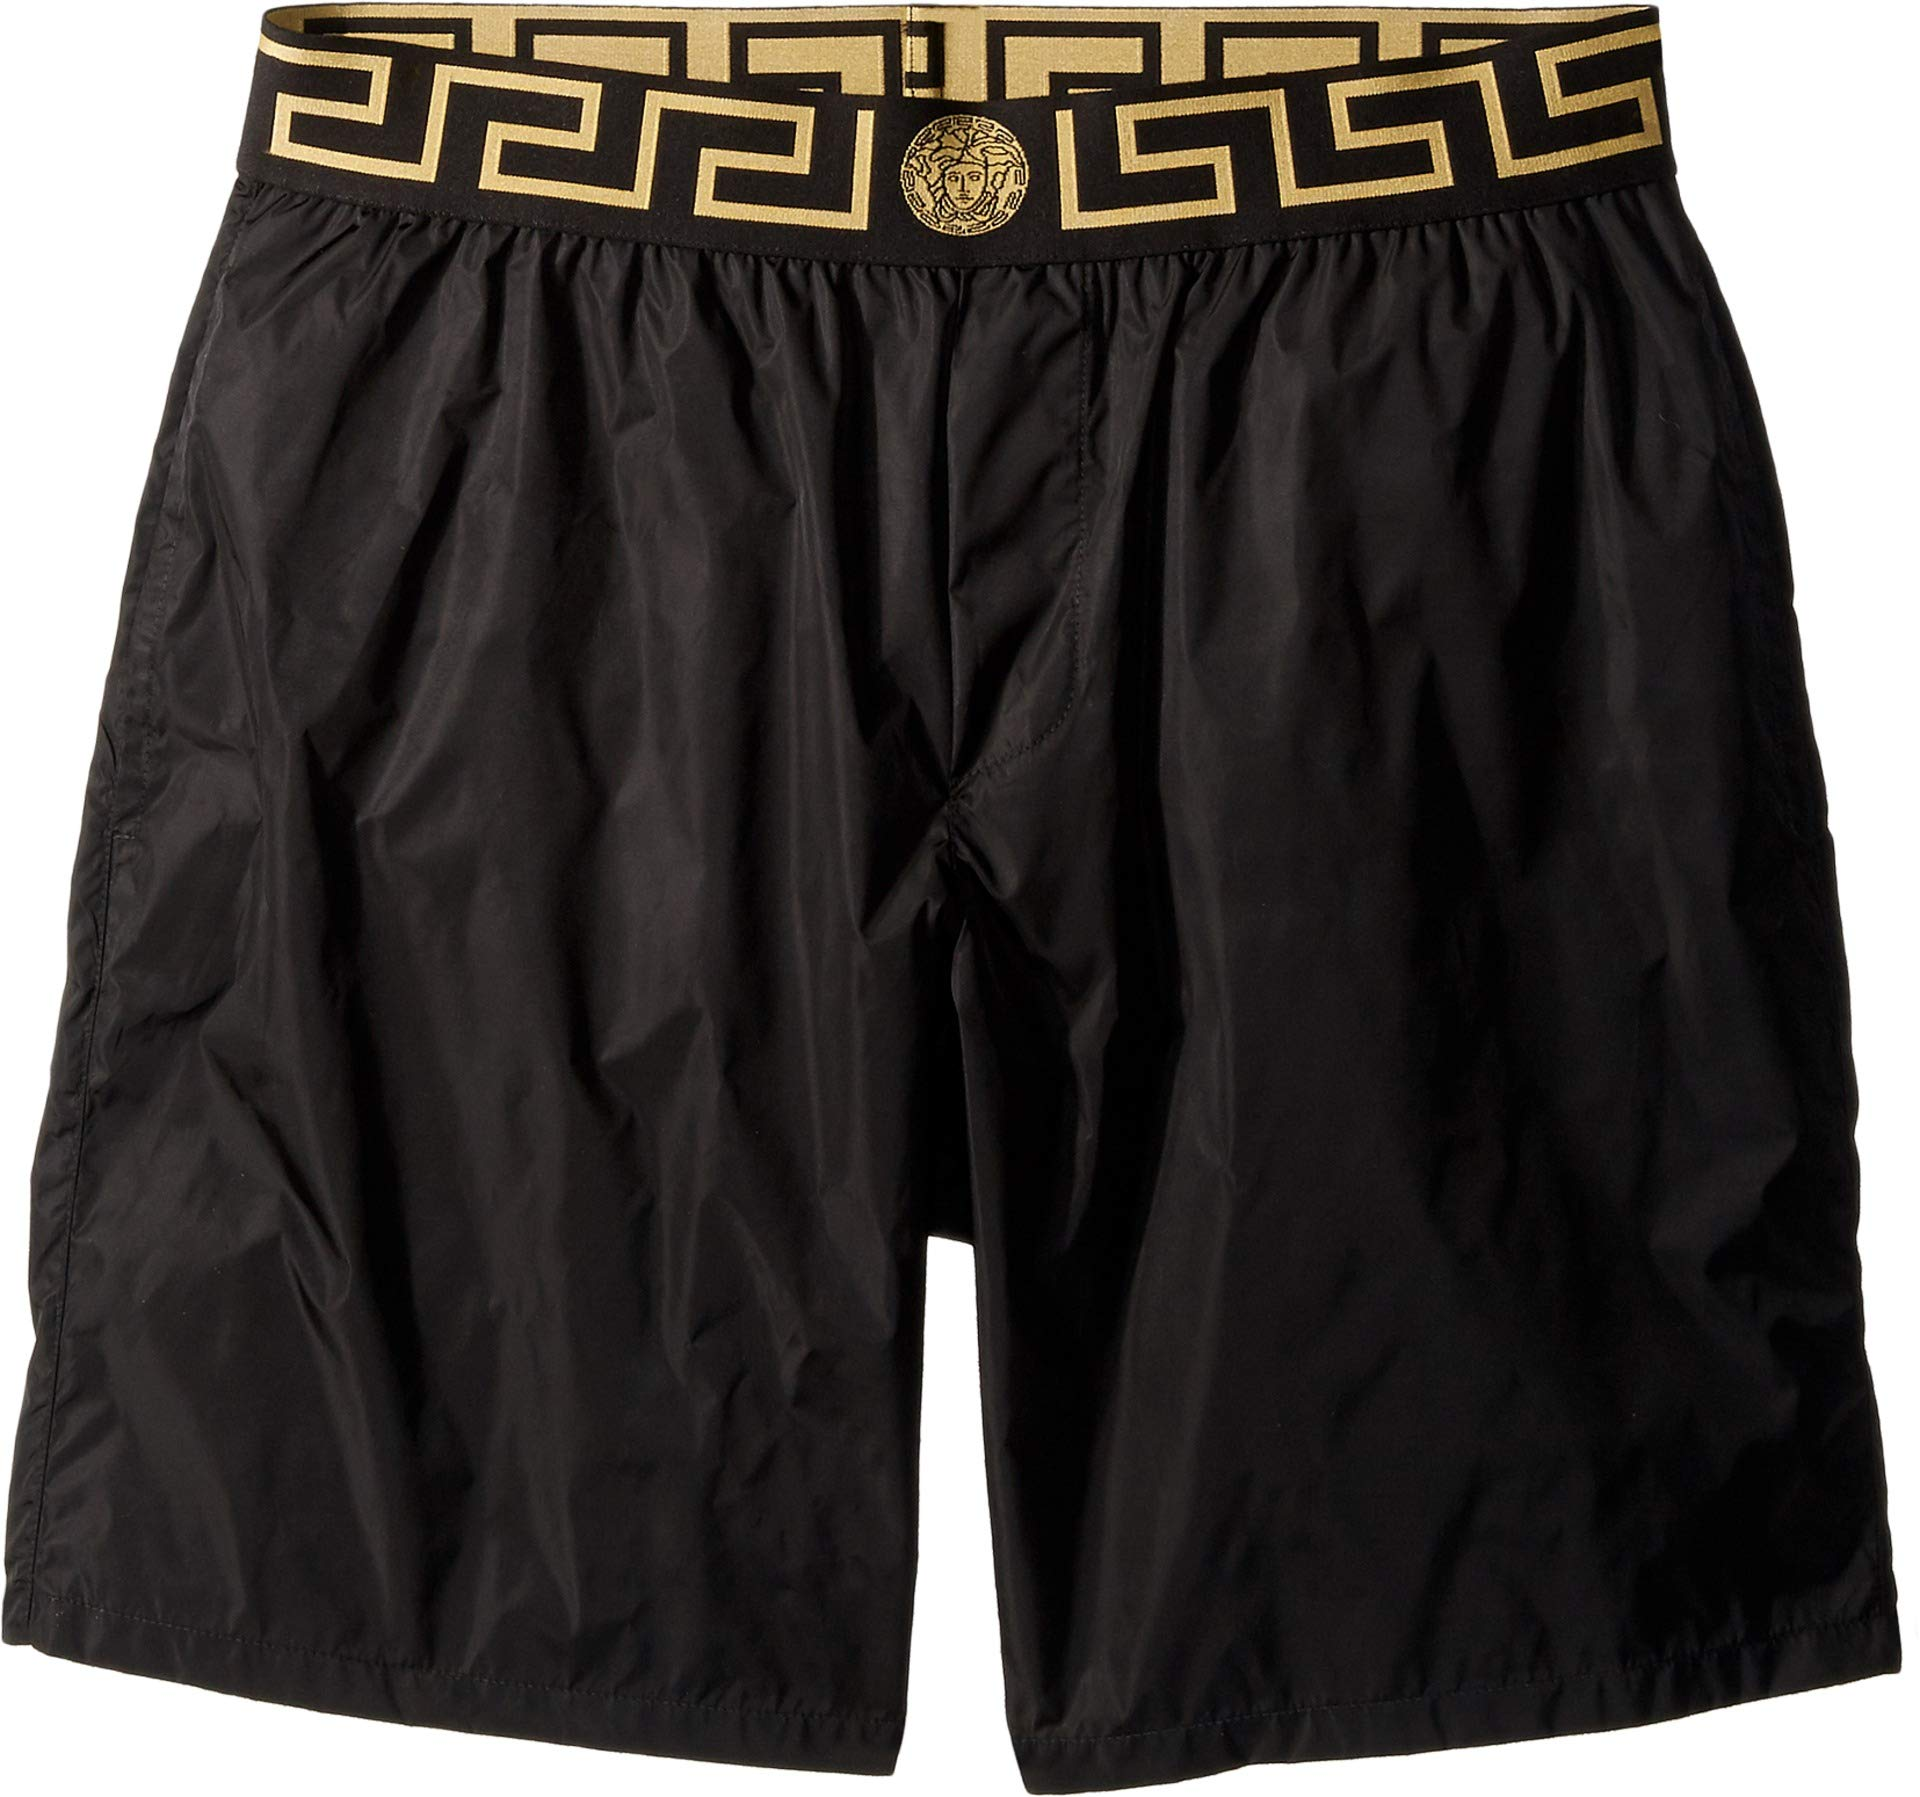 Versace Men's Beach Long Short Boxer Black/Gold/Greek Key 5